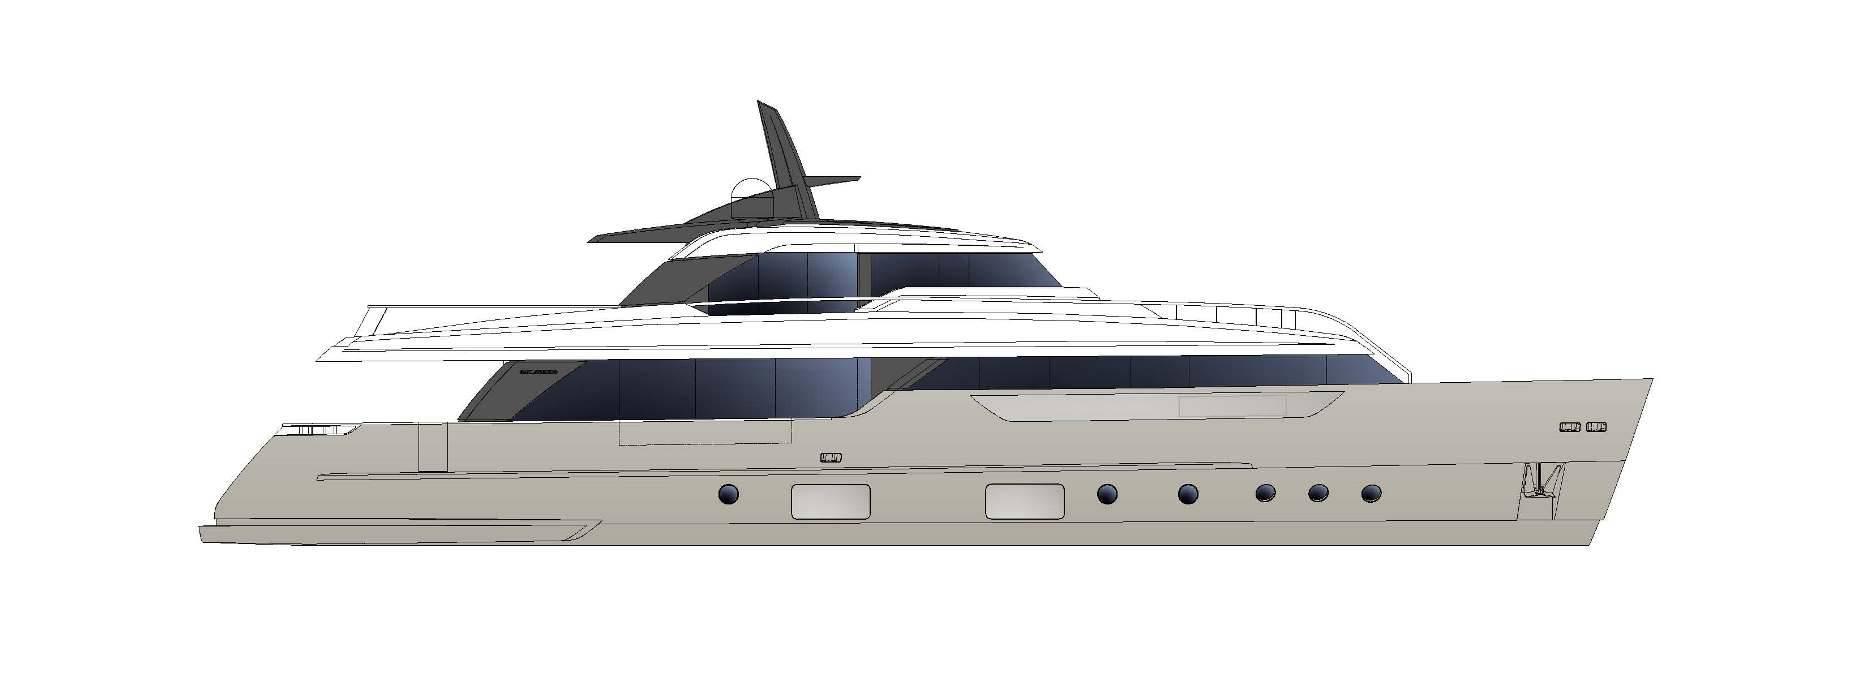 Sanlorenzo Yachts SD96 外观